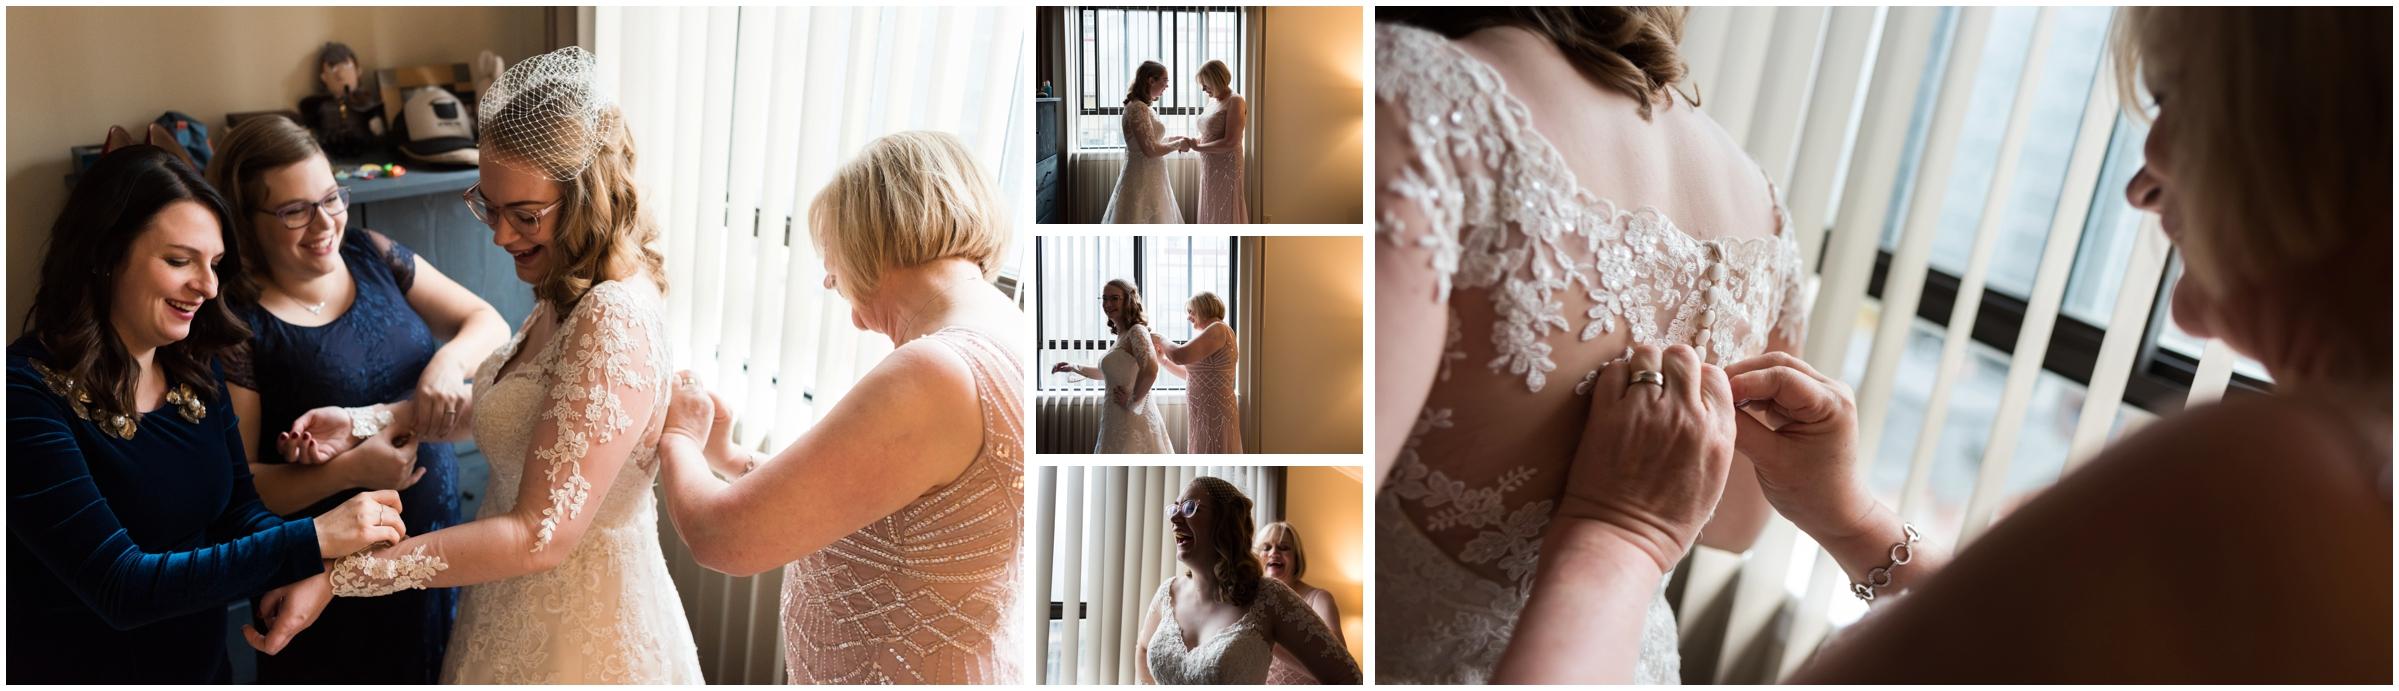 Ottaw Wedding Allison Andrew - (Selena Phillips-Boyle)_0017.jpg